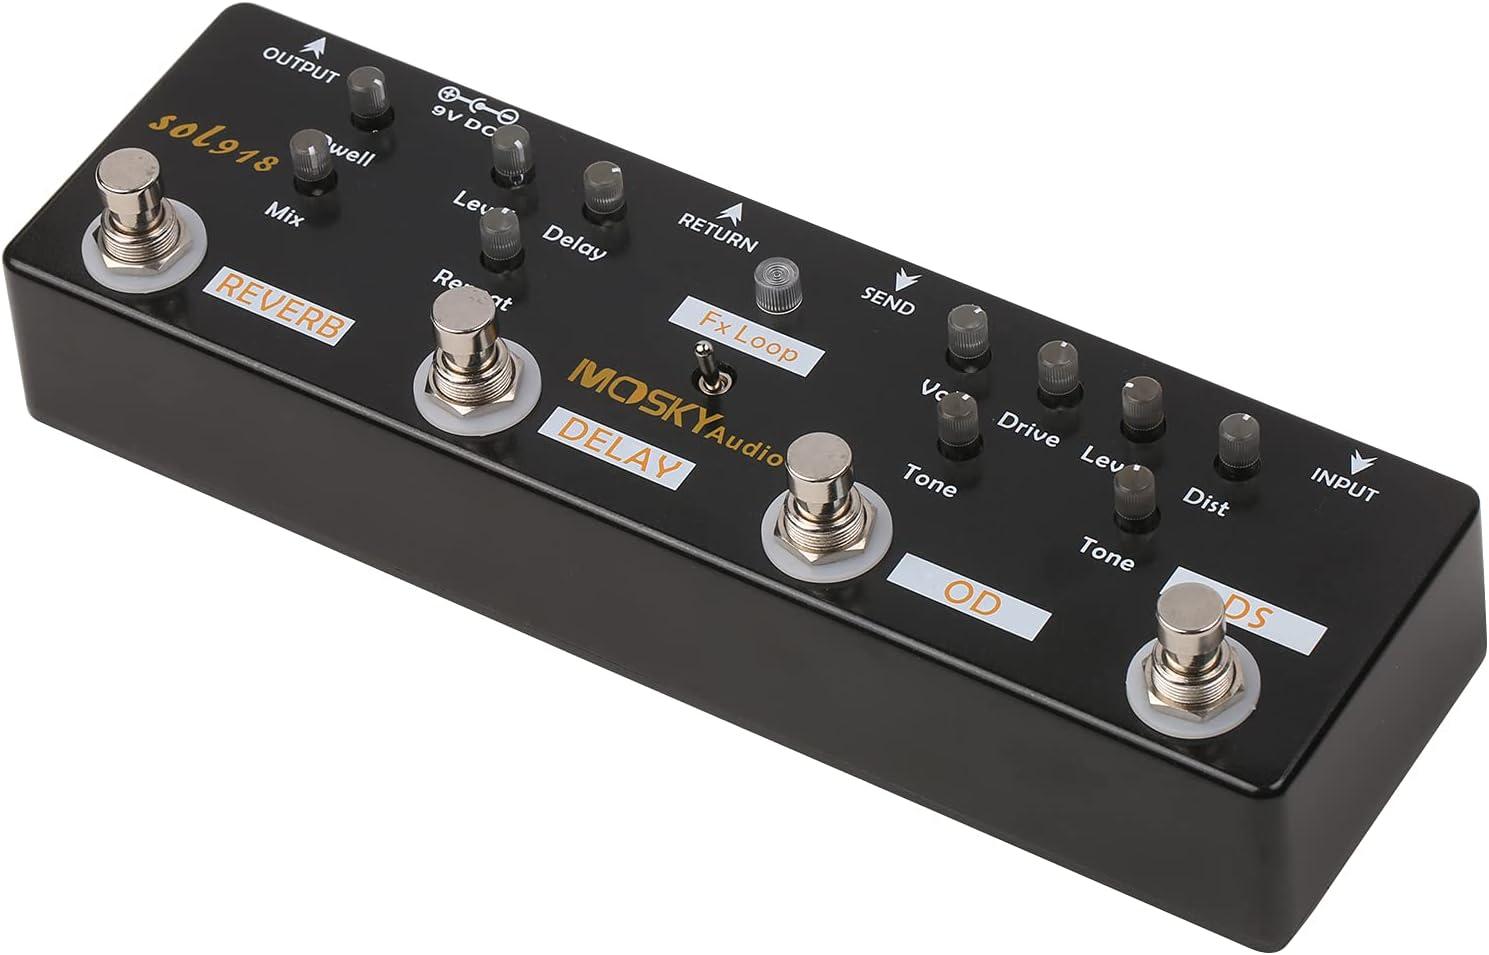 Summina Pedal de Efectos Múltiples 5 en 1 Pedal de Guitarra de Efectos Combinados True Bypass Dispositivo de Efectos Combinados Múltiples en Uno Reverberación Delay Fx Loop Overdrive Distorsión